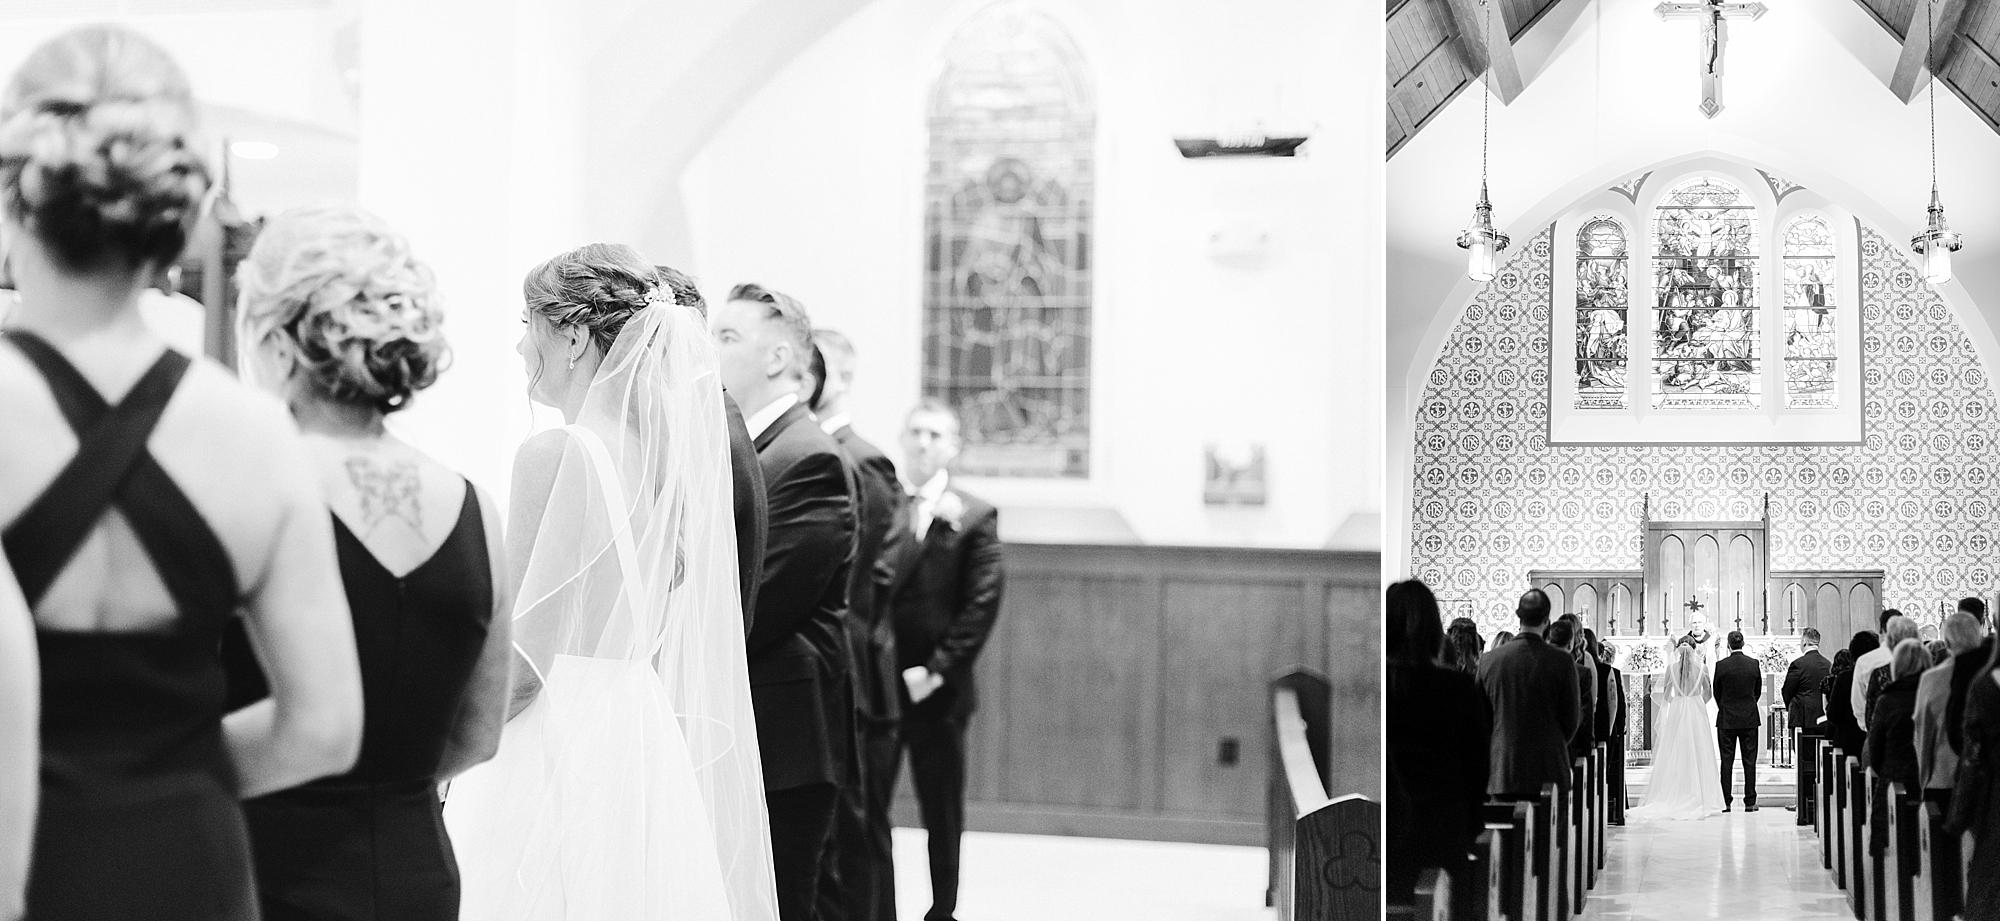 eisleyimages-irish-wedding-boston-seaport_0067.jpg